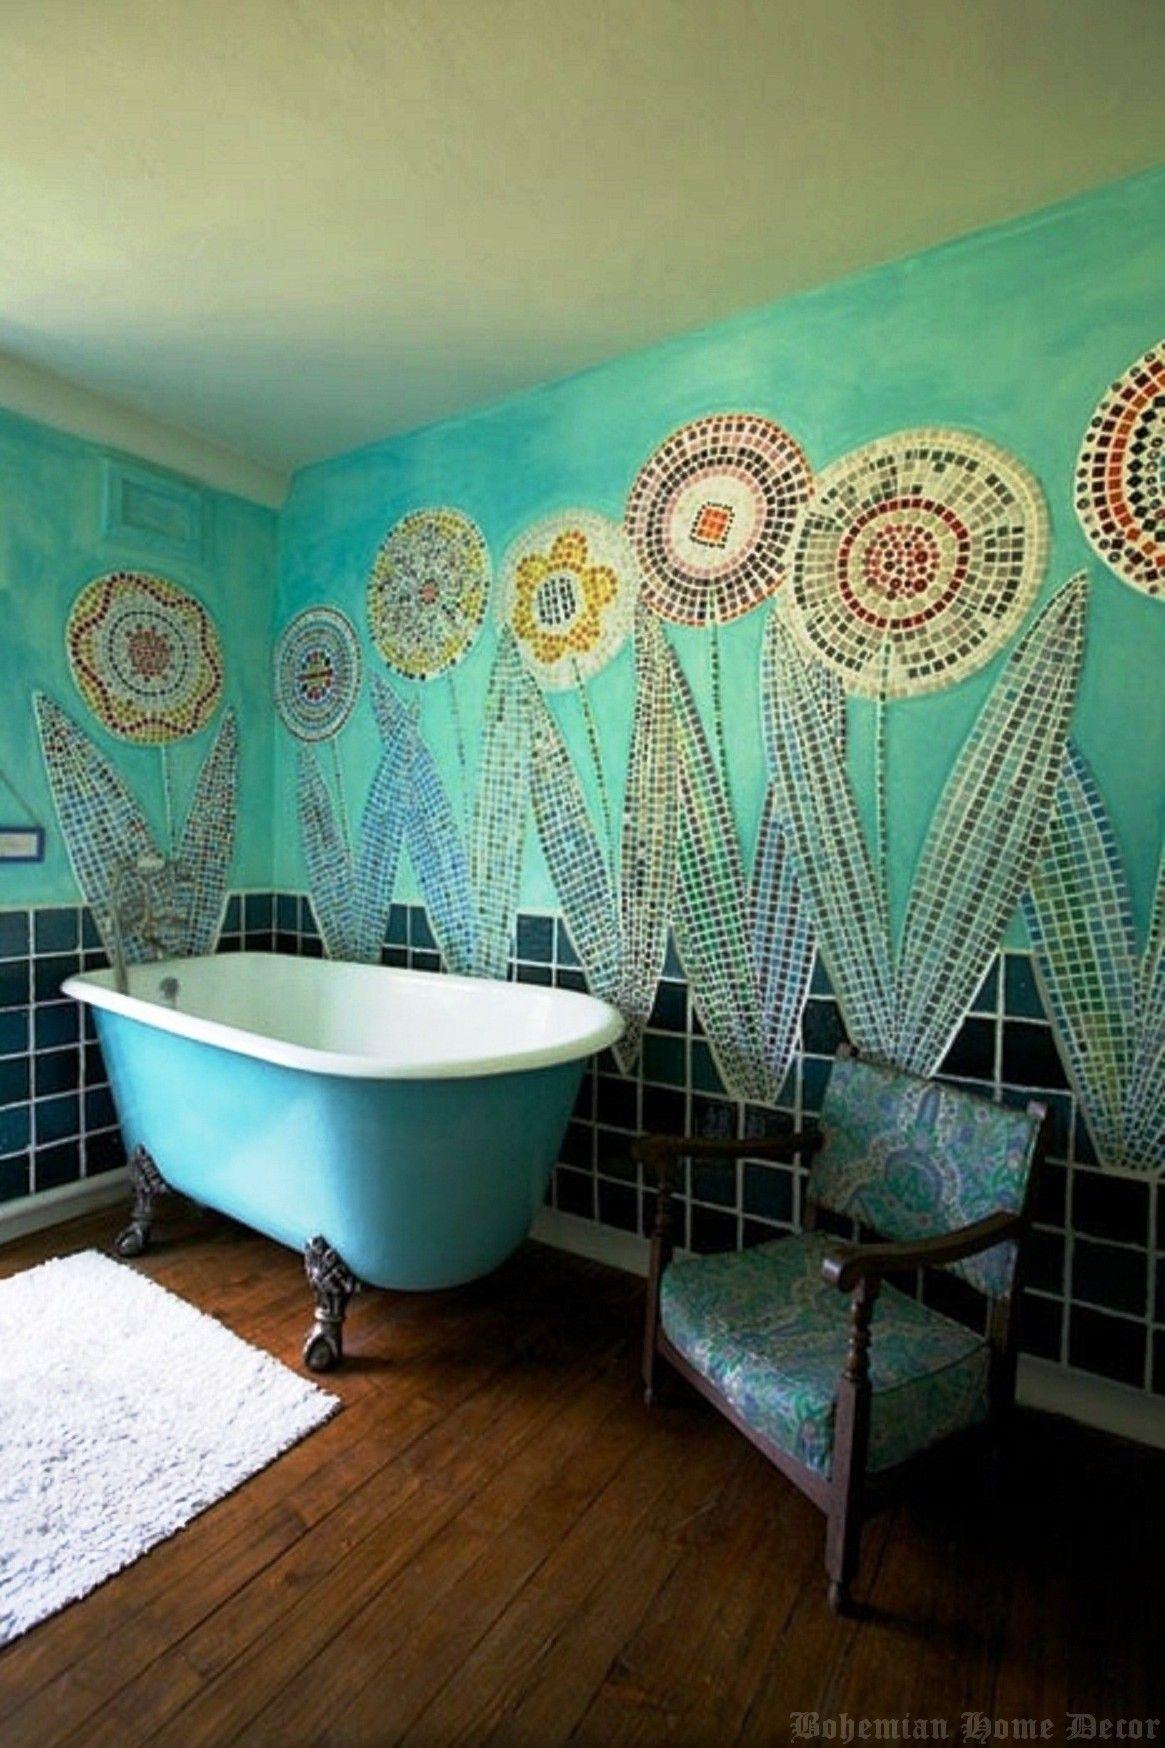 52 Ways To Avoid Bohemian Home Decor Burnout Oct 2020